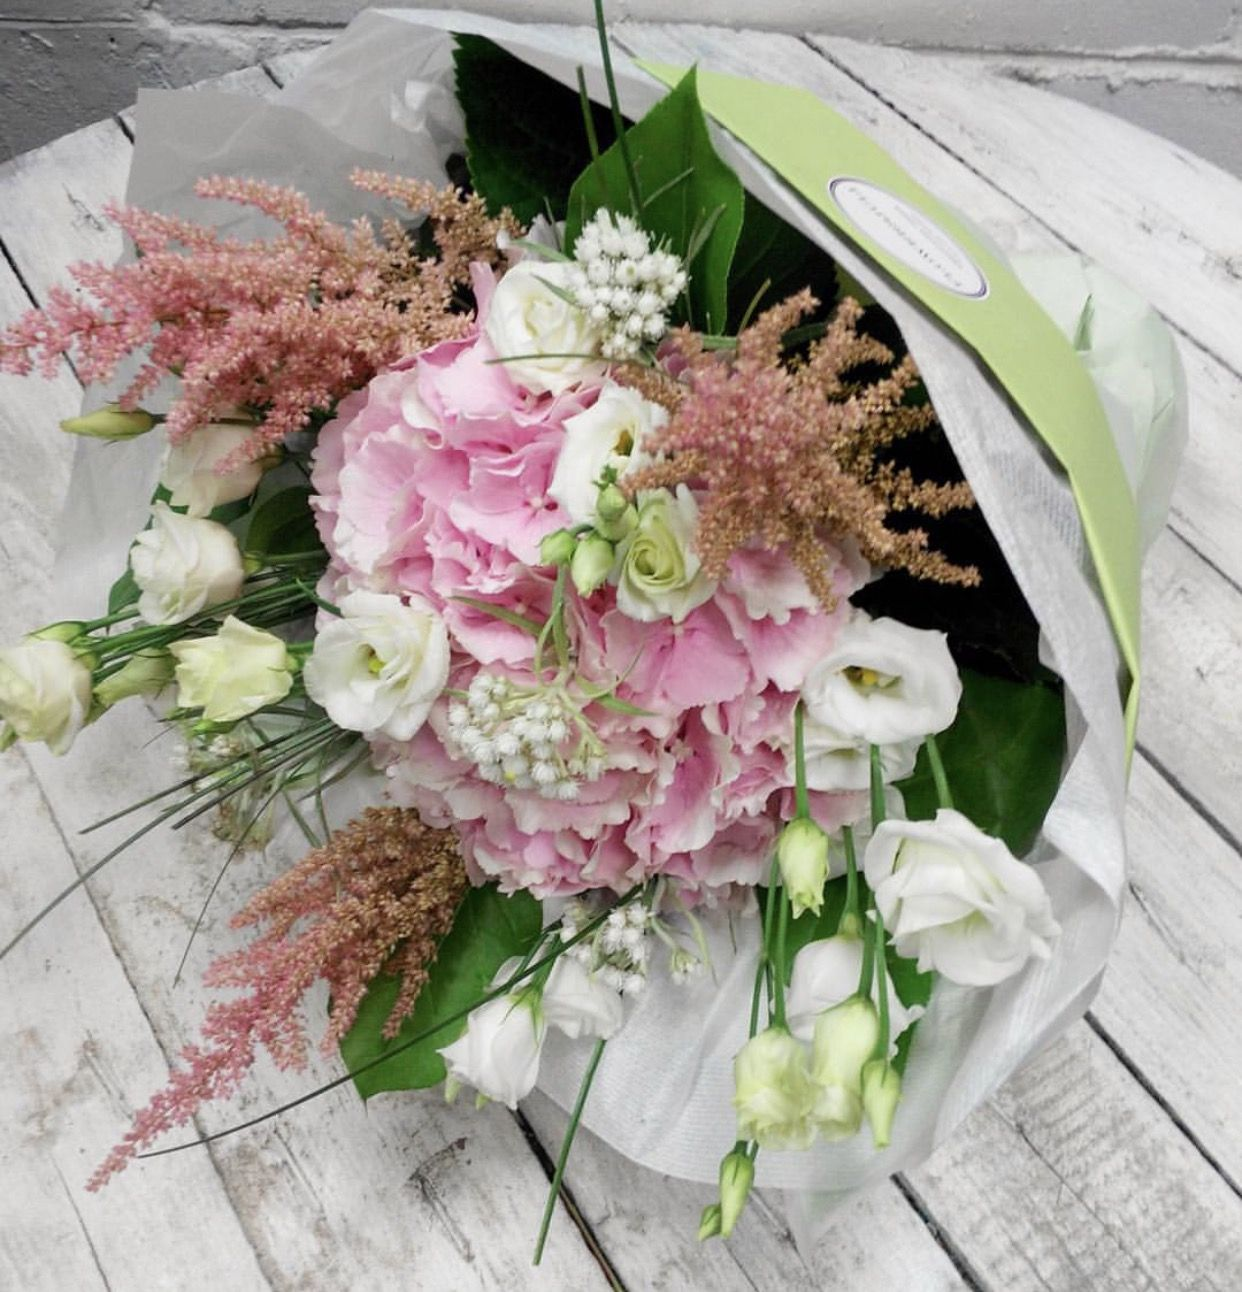 Pin by 🌹chlöebabyxöxö🌹 on *༺༶ ༚ i ️Flowers ༚ ༶༻* Flowers